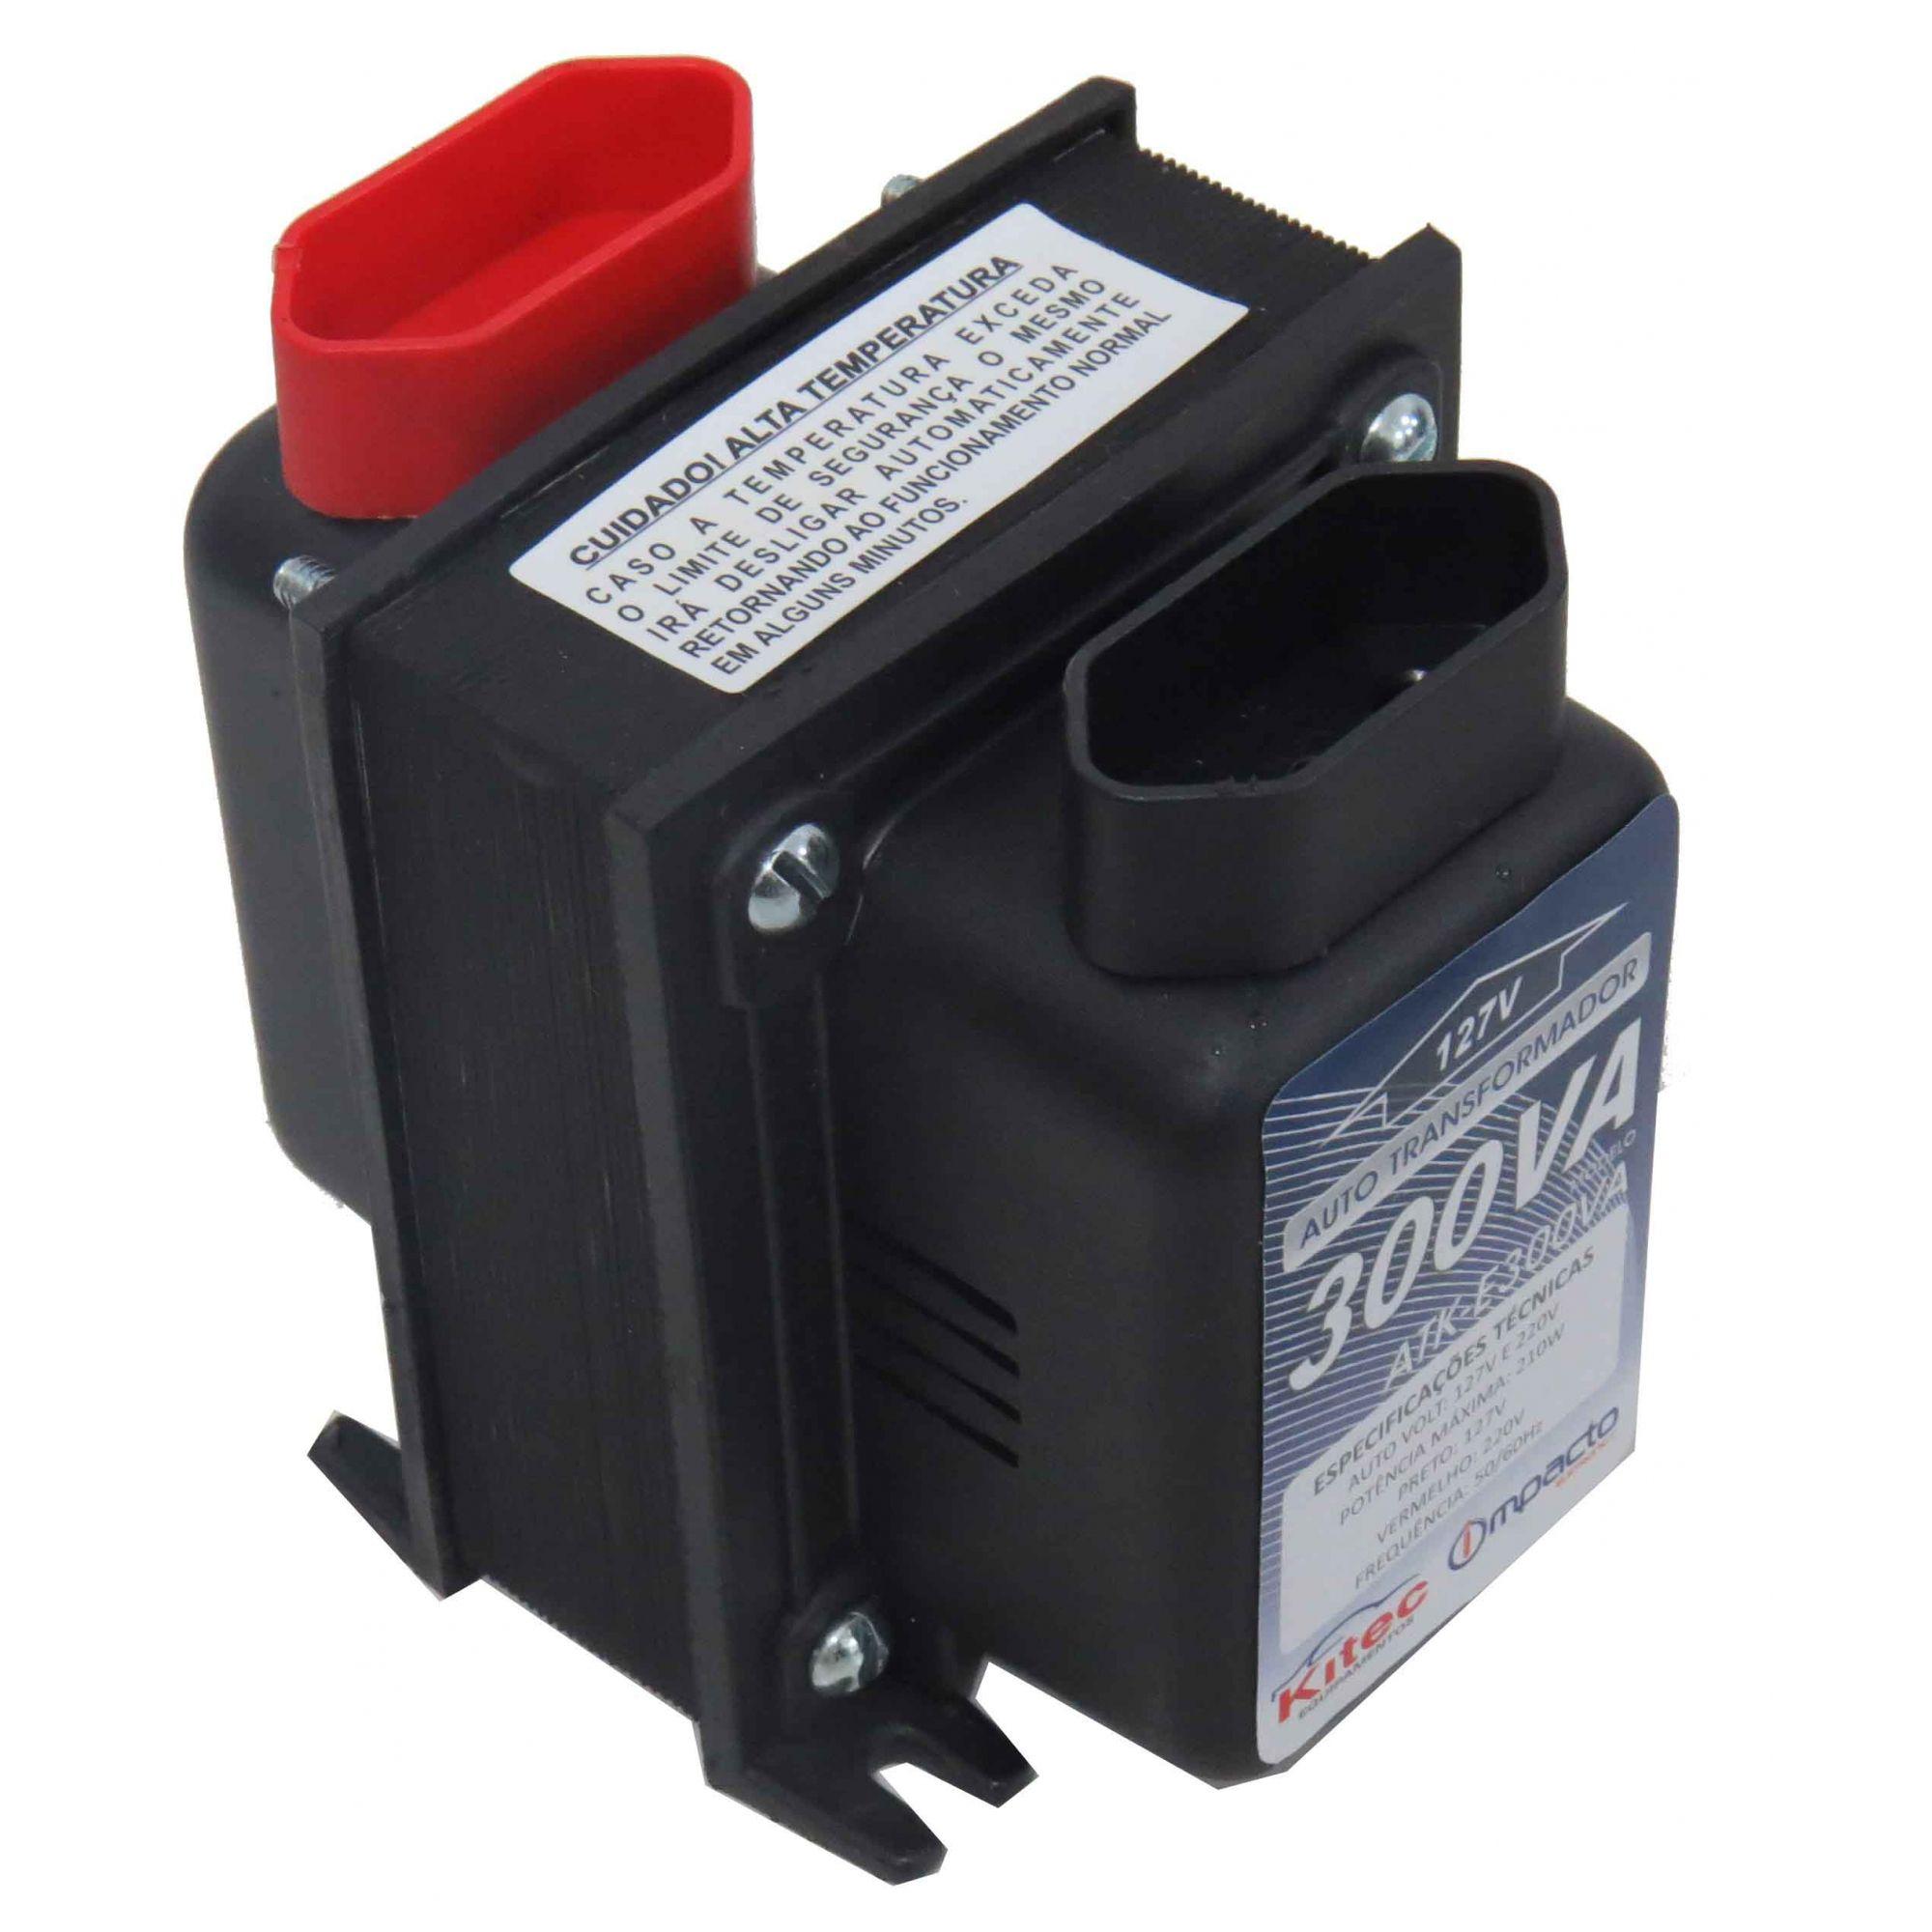 Autotransformador Transformador De Voltagem 300va 127/220v  Cód.262281